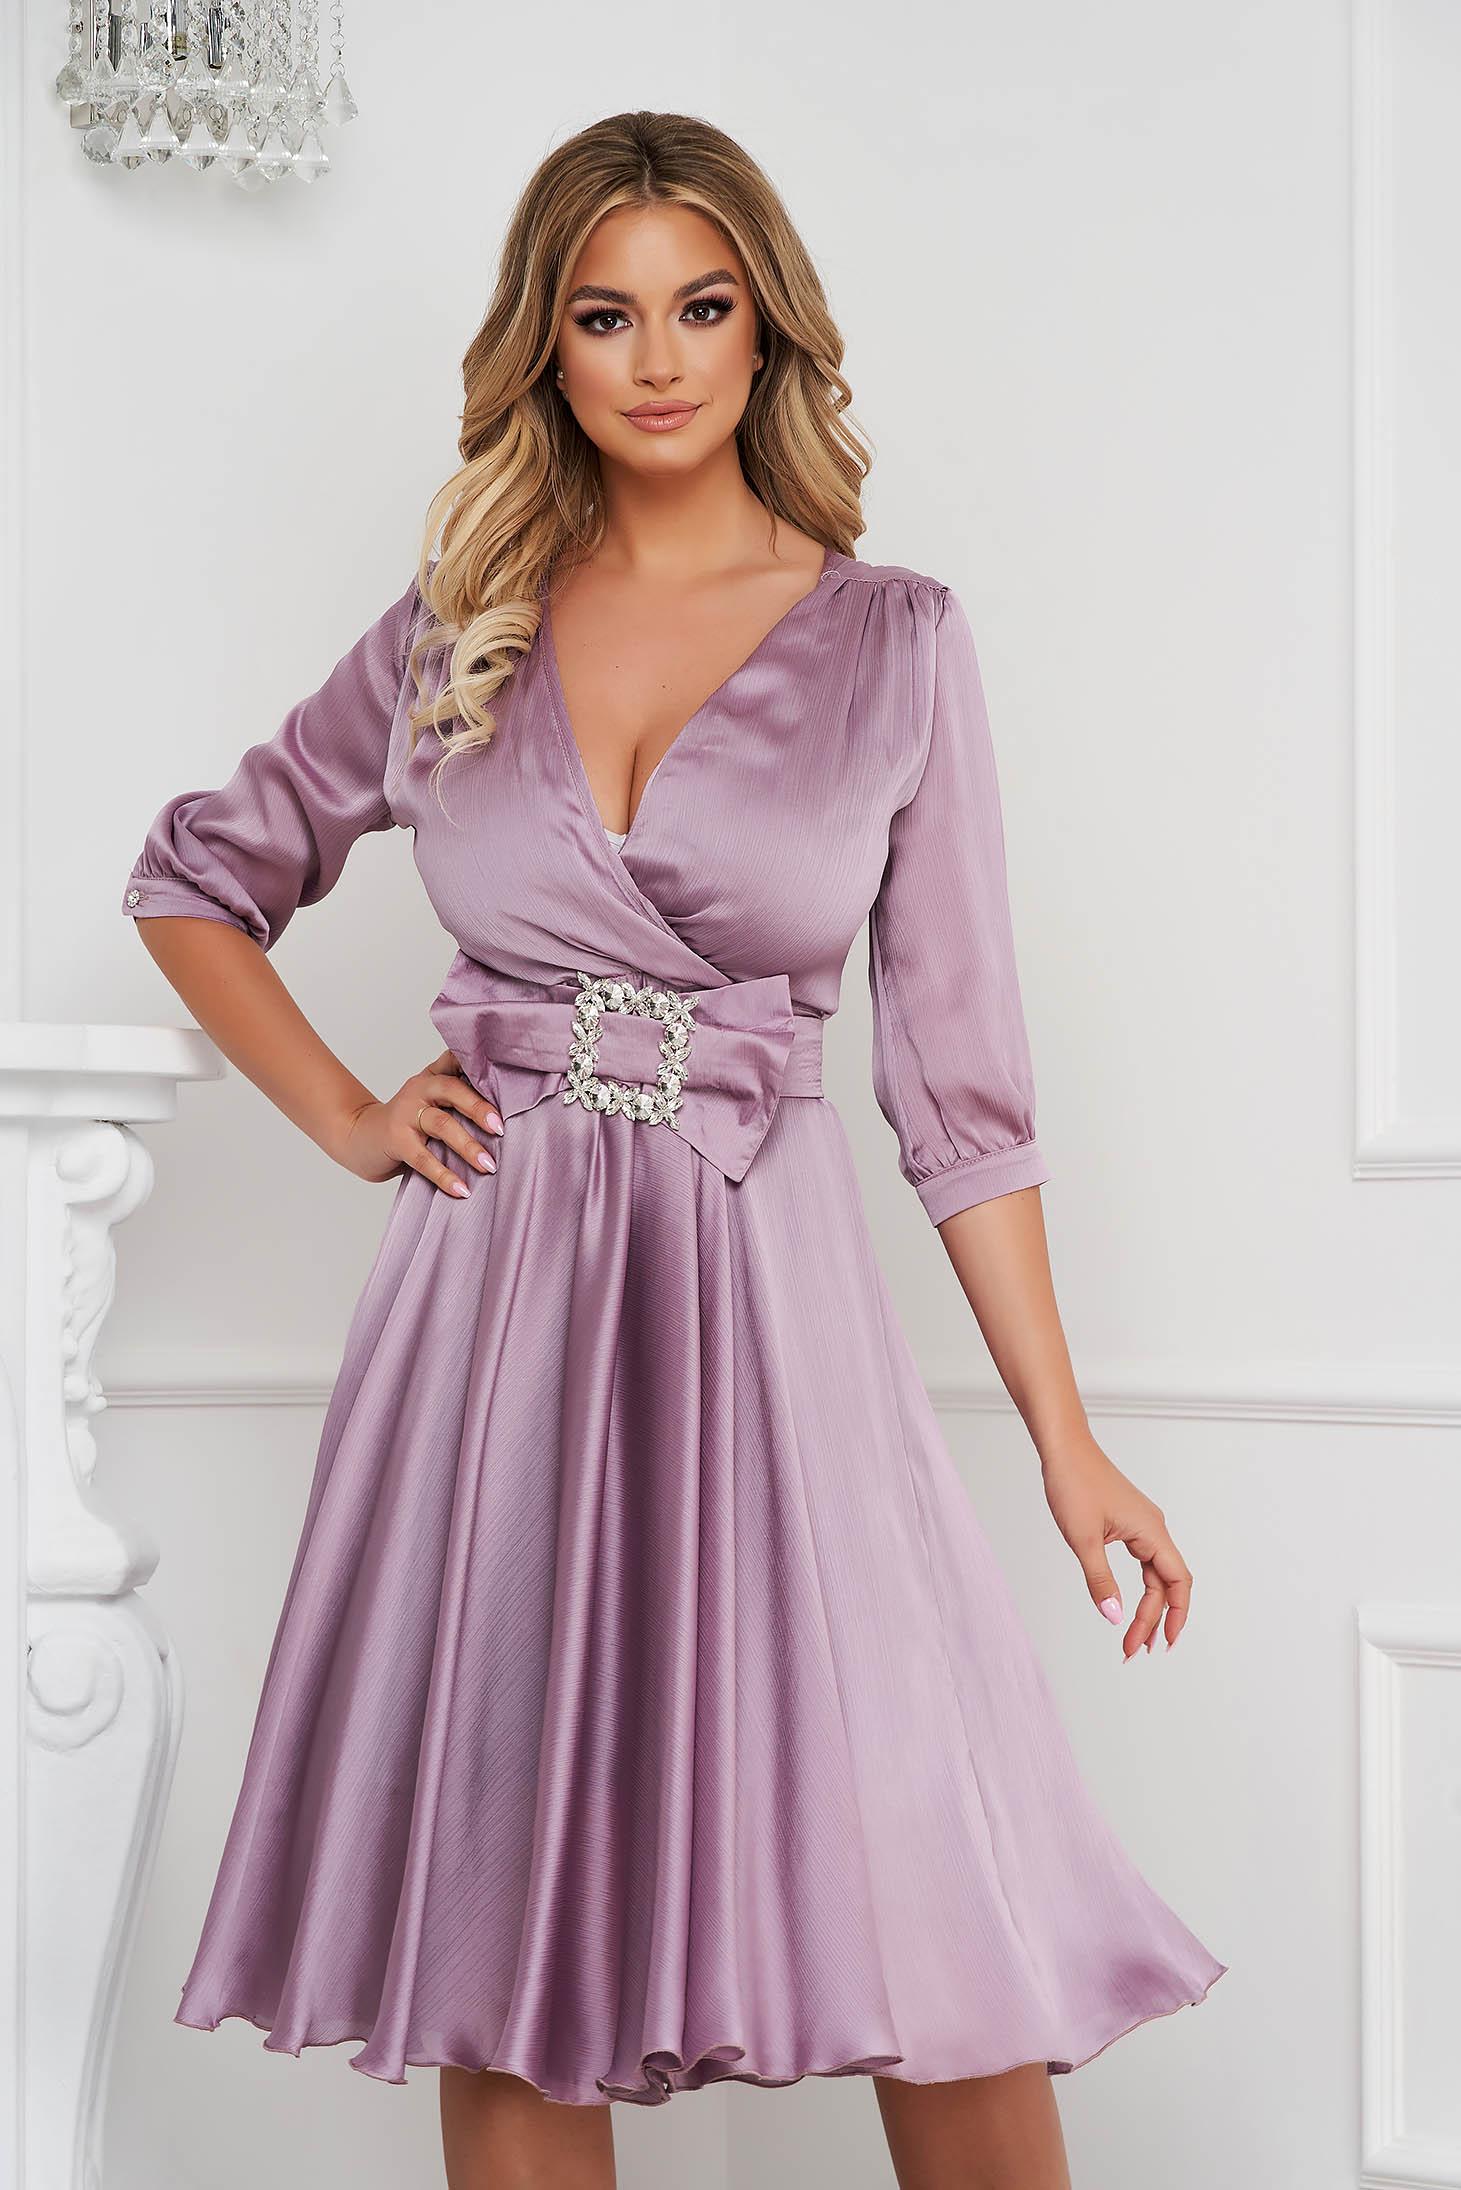 Lightpurple dress elegant midi cloche from satin buckle accessory